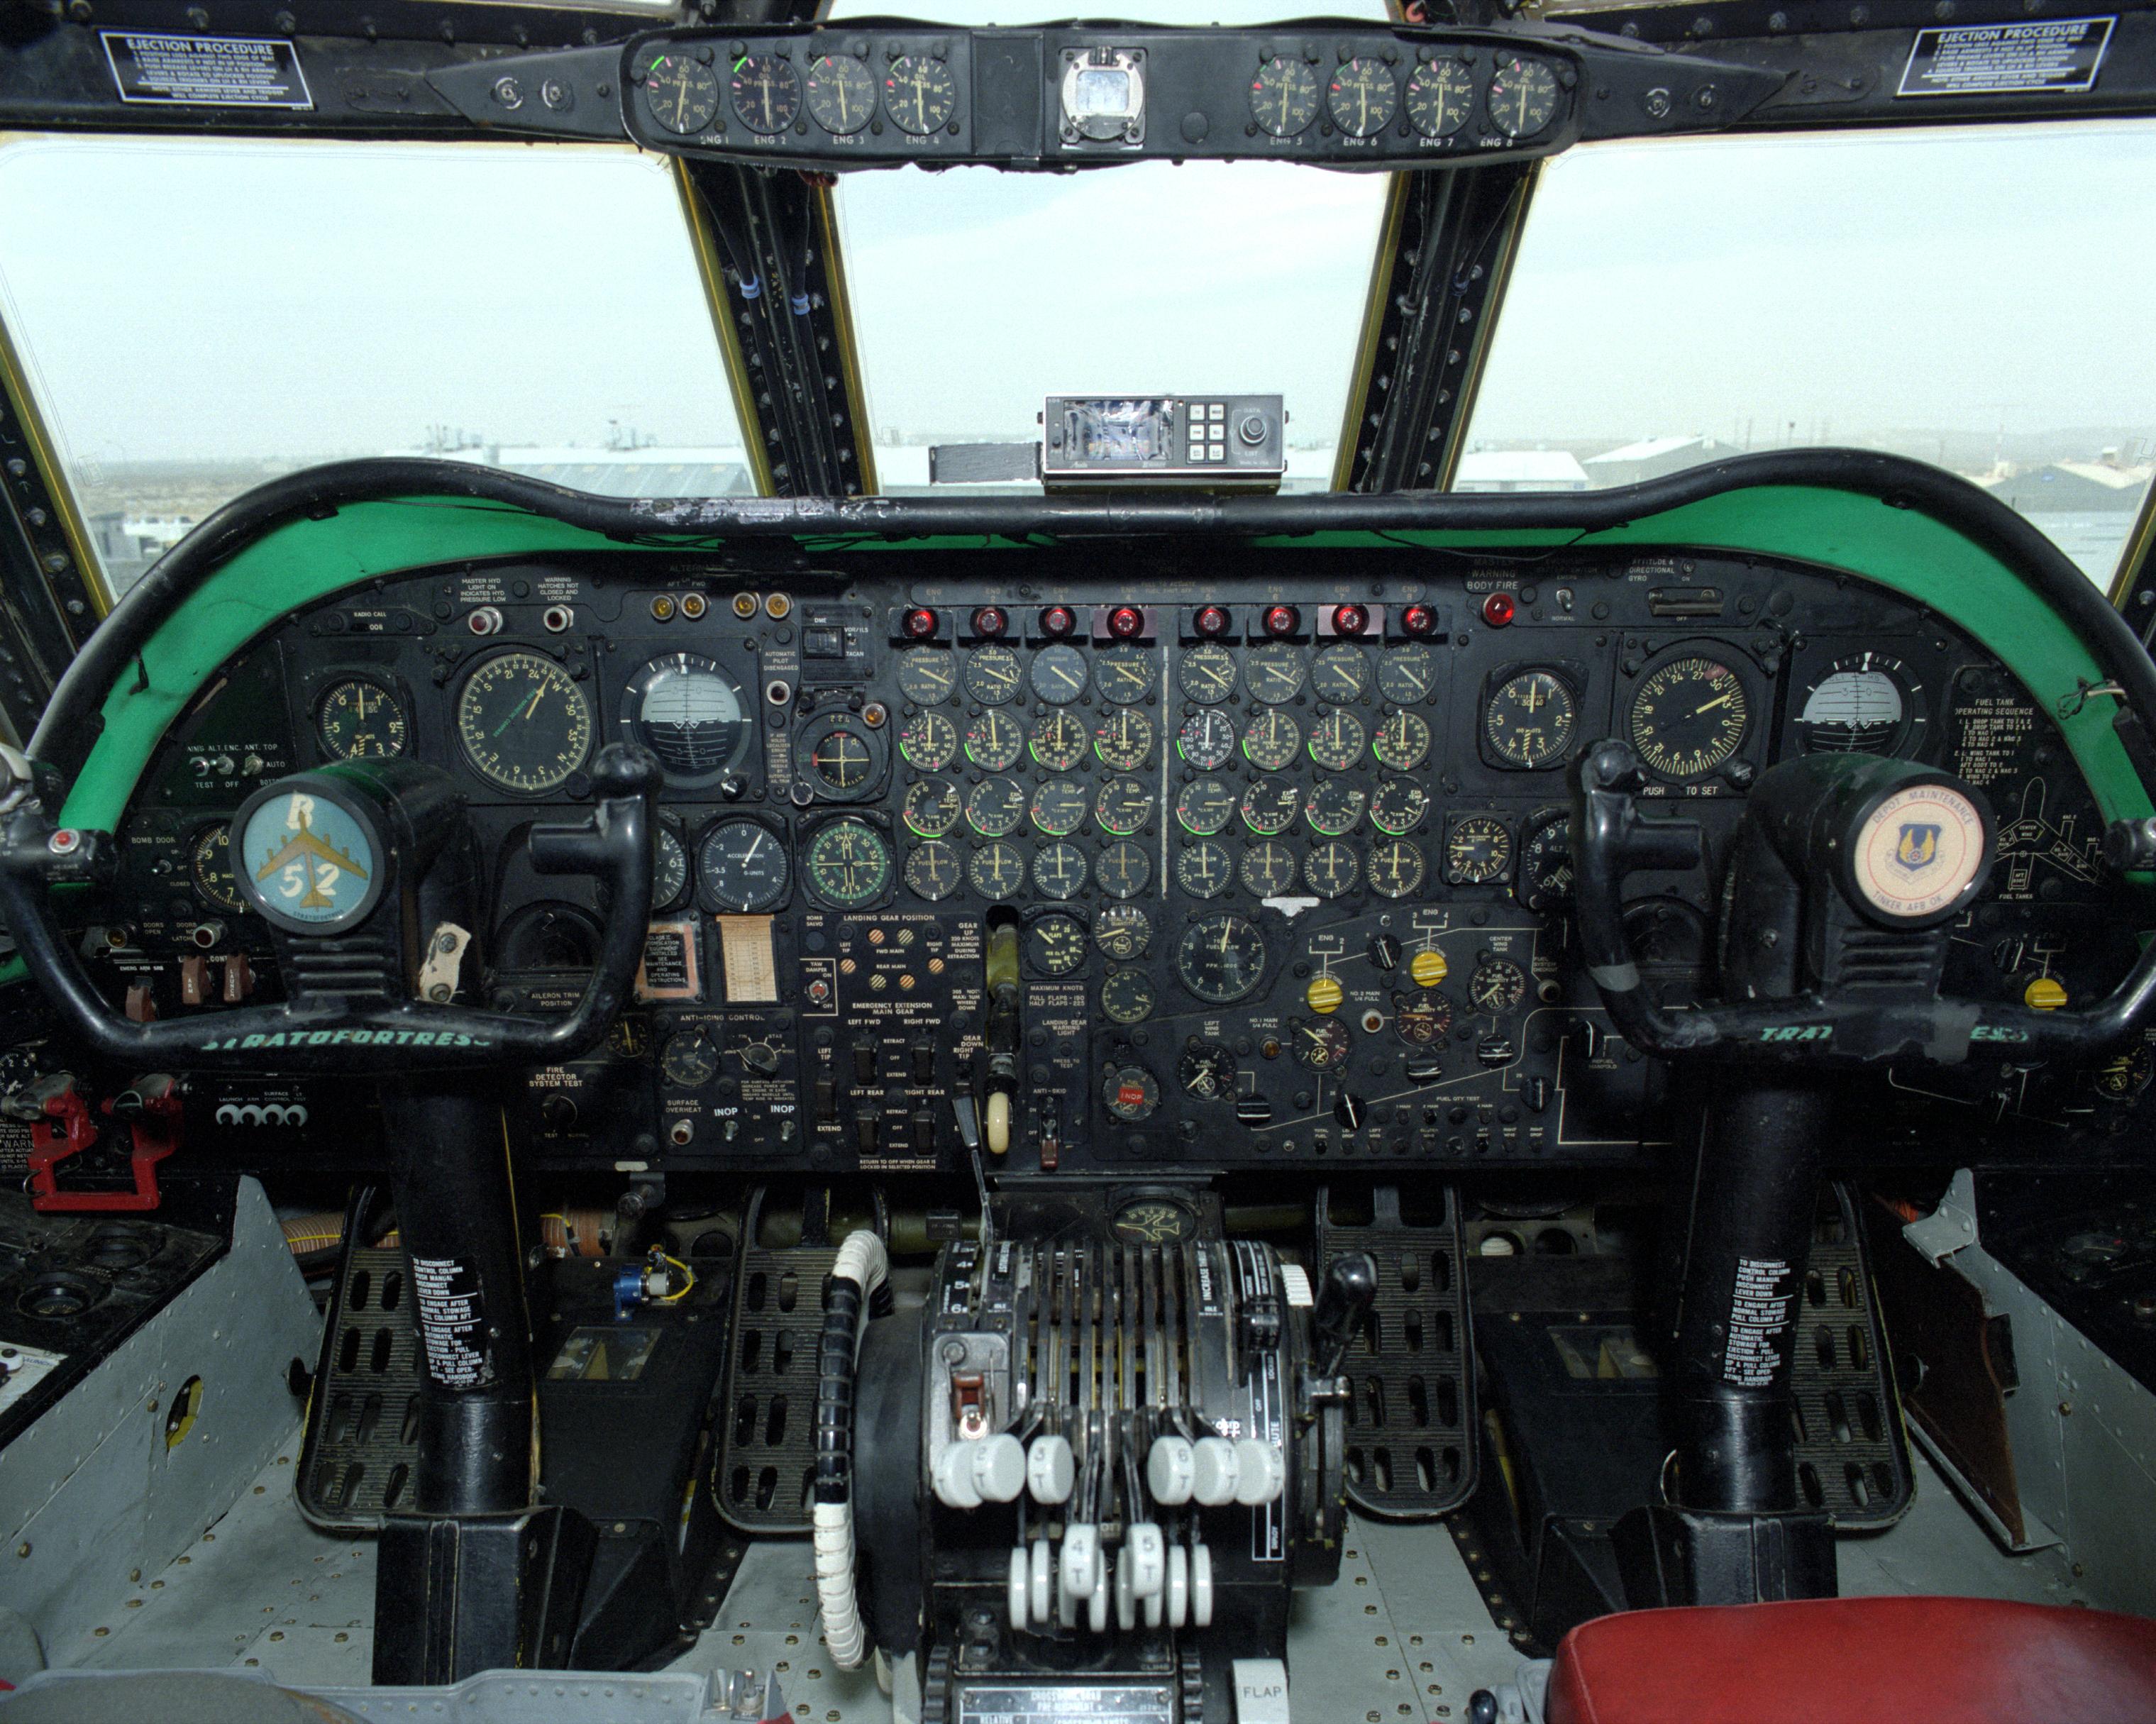 Cockpit Instrument Panel : B cockpit instrument panel cockpits